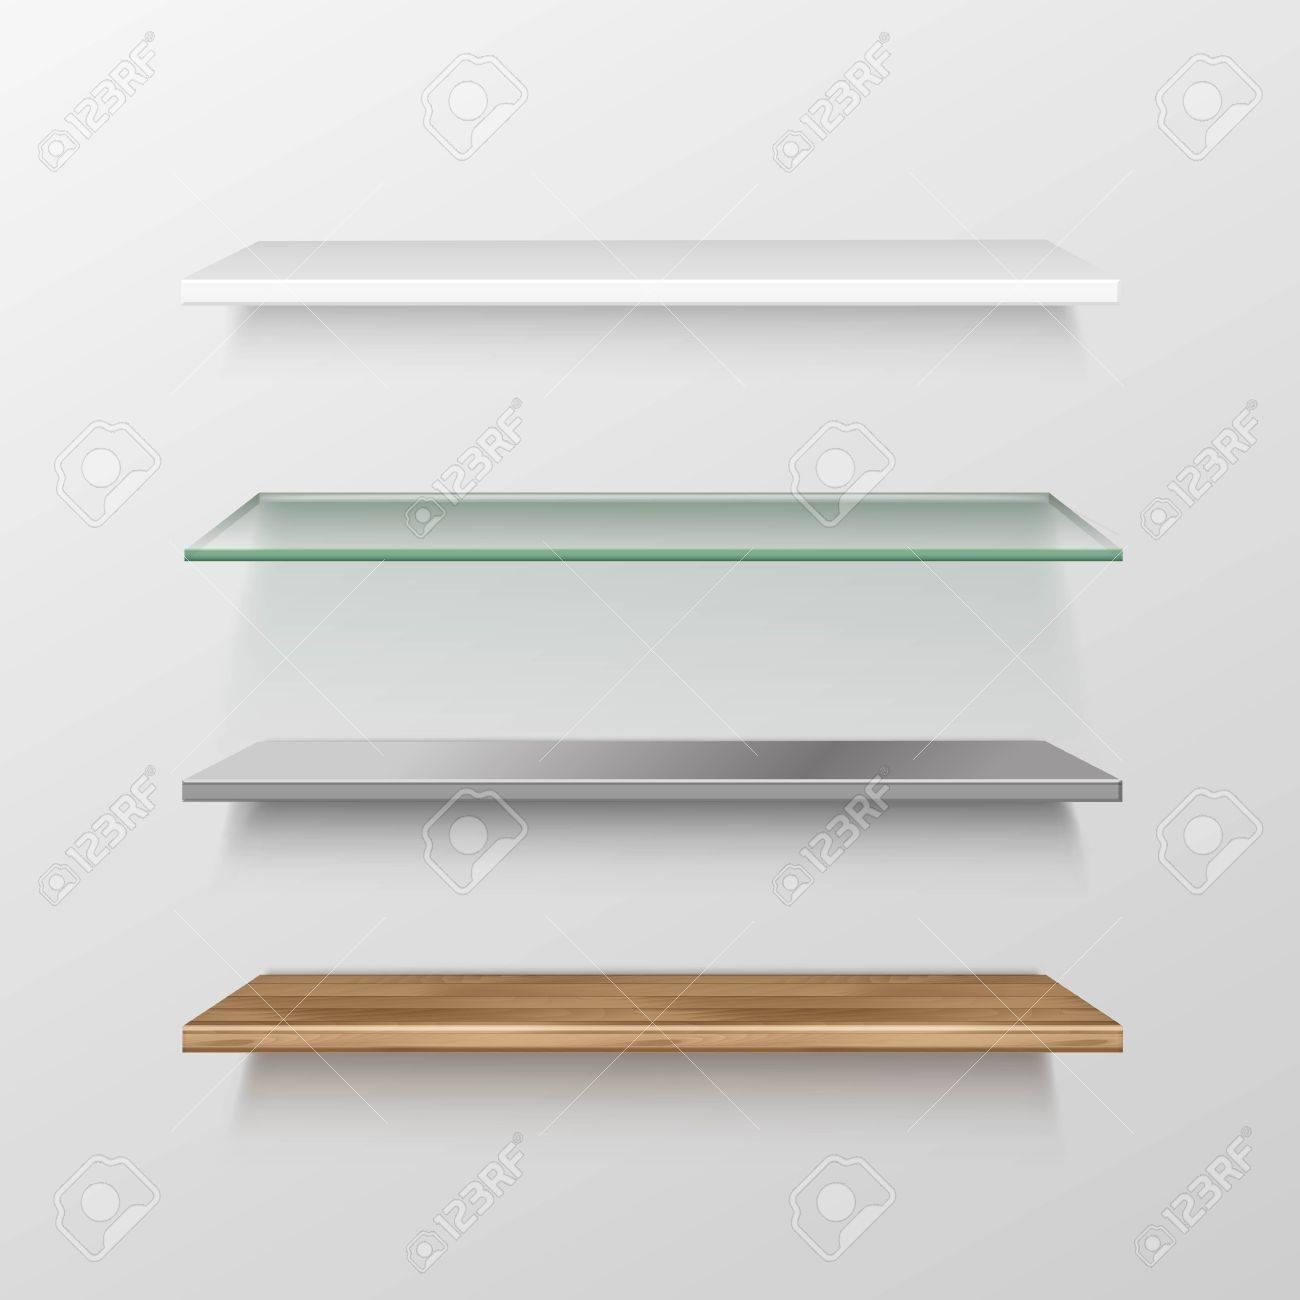 Set Of Empty Wood Glass Metal Plastic Shelf Shelves Royalty Free ...